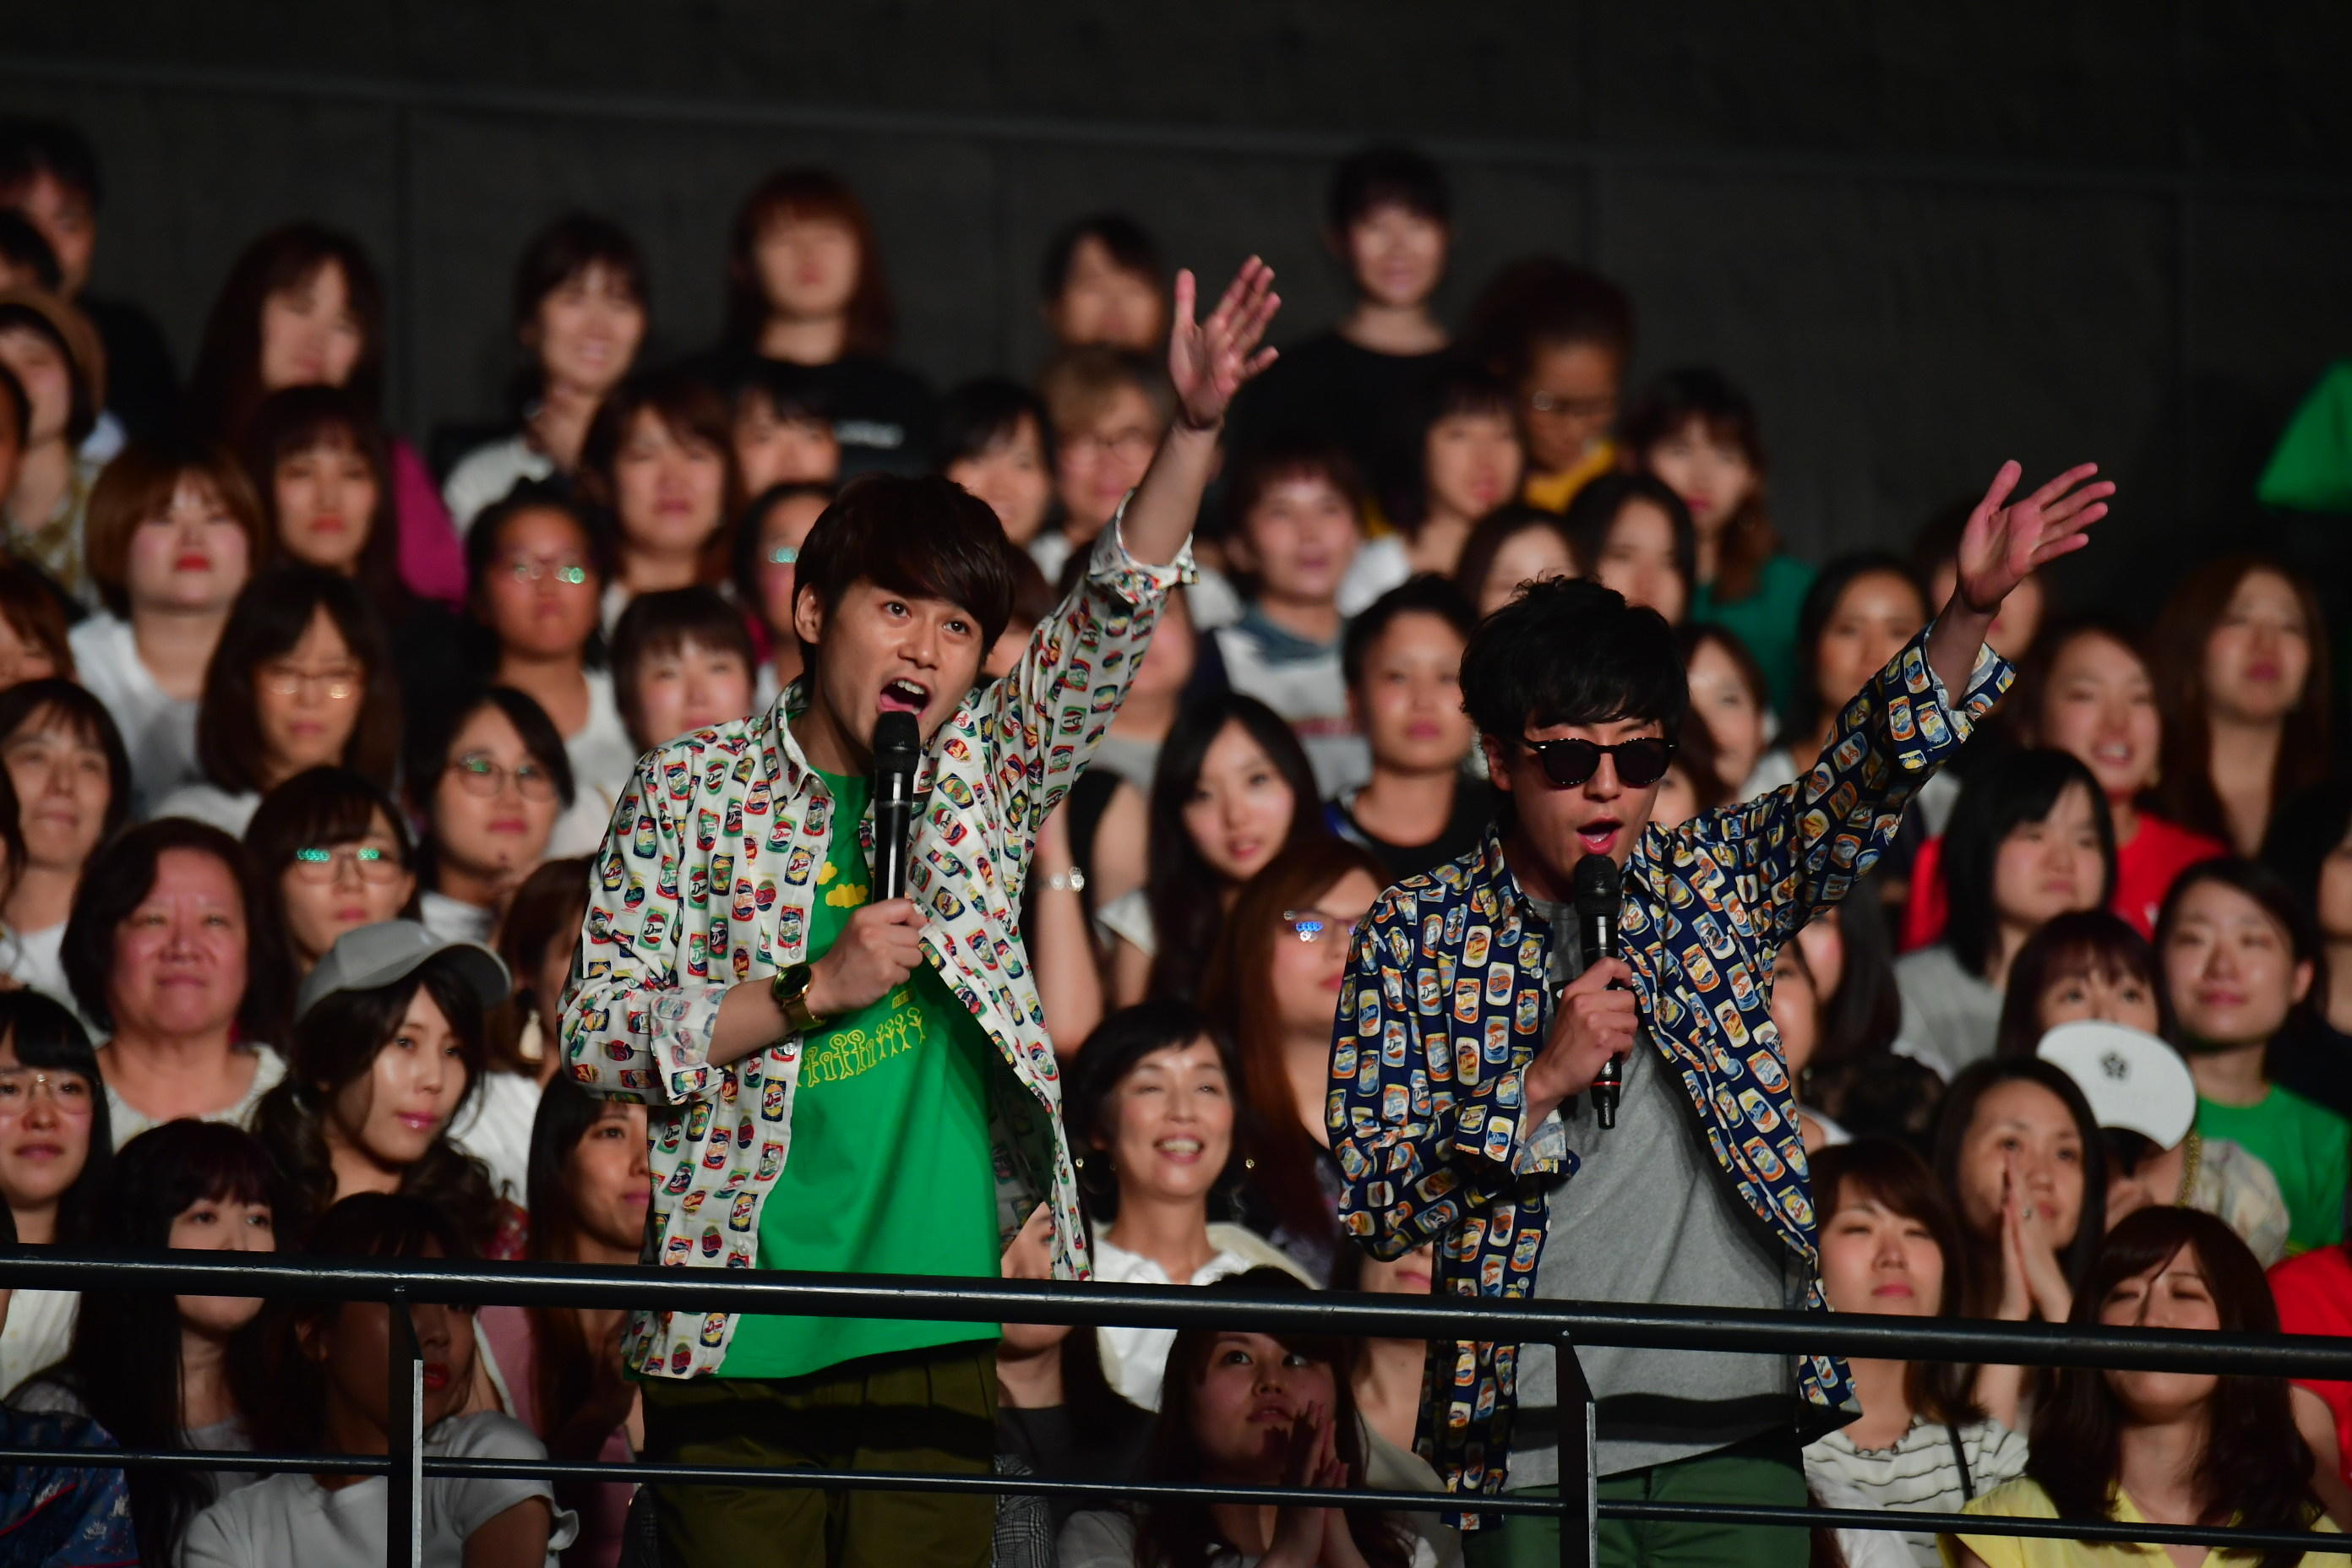 http://news.yoshimoto.co.jp/20180803012013-d1ddc4370568c40f7e1addaed45c0879bc6bc5ab.jpg